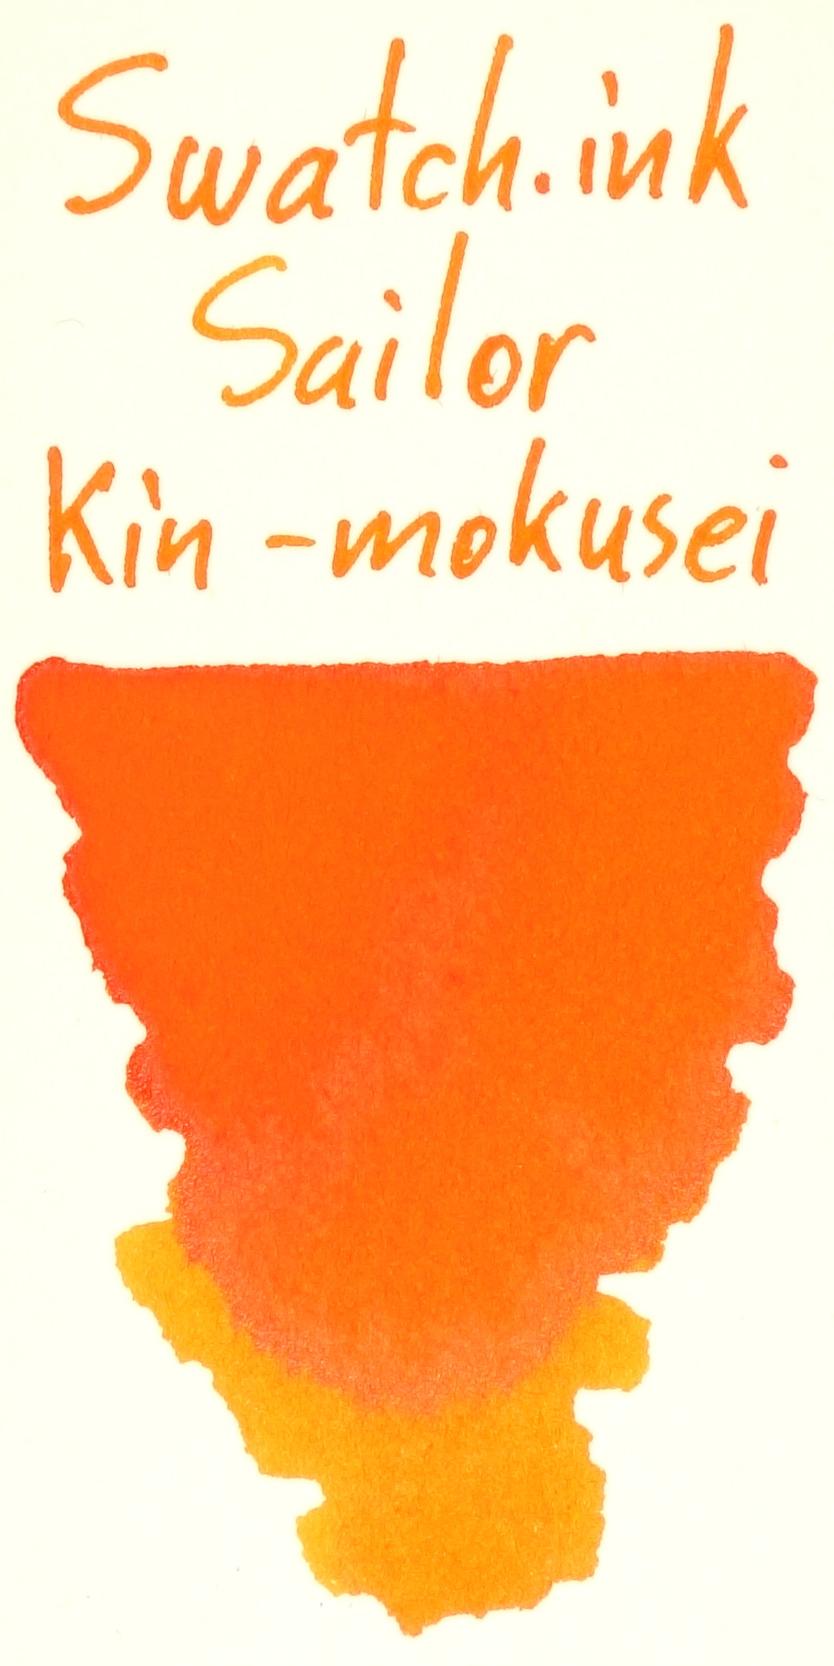 Sailor Kin-mokusei Swatch.ink.JPG